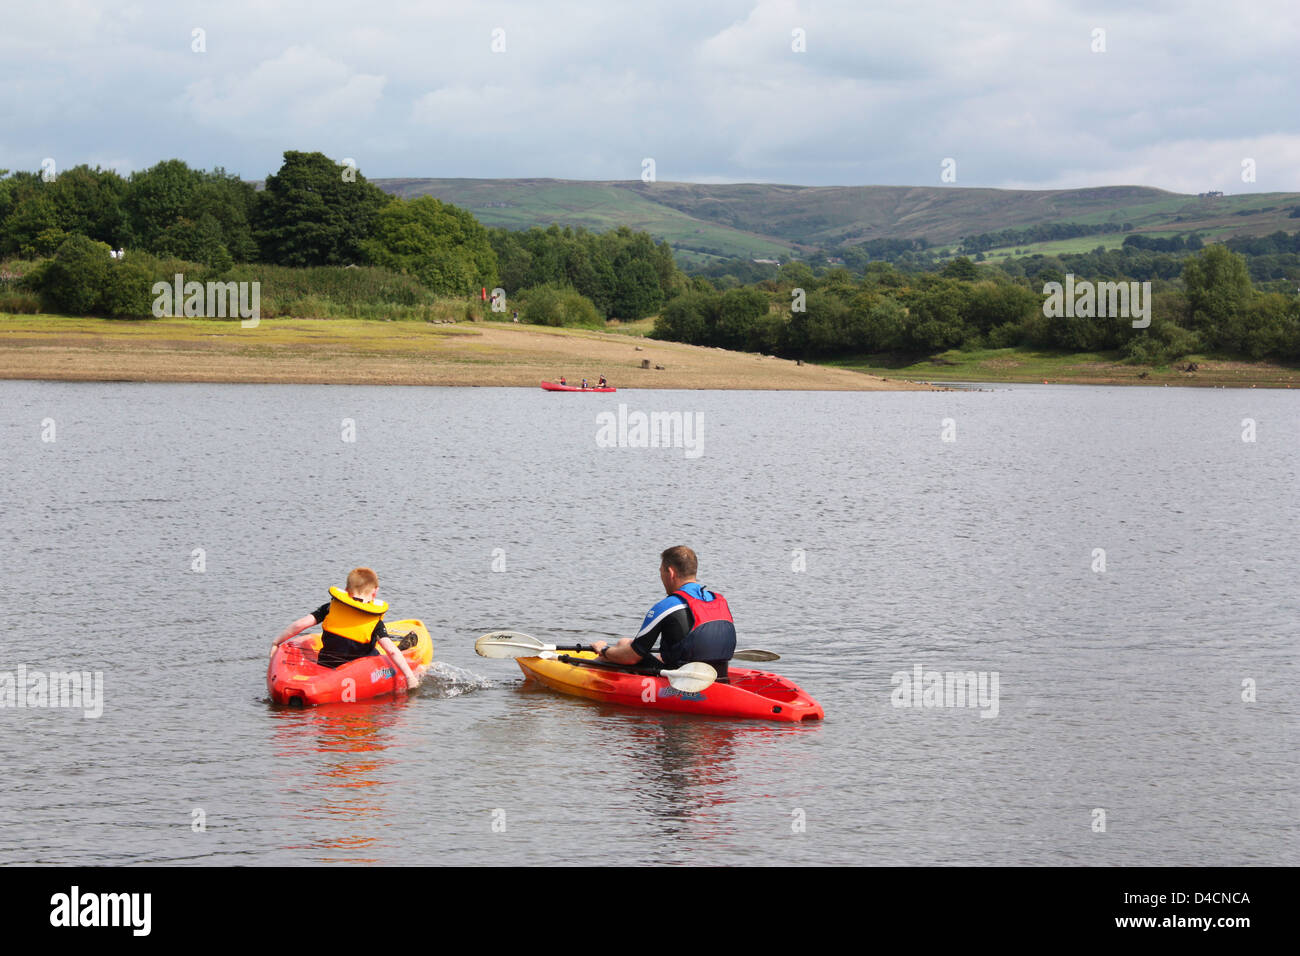 Boating in a lake in Peak District, UK Stock Photo